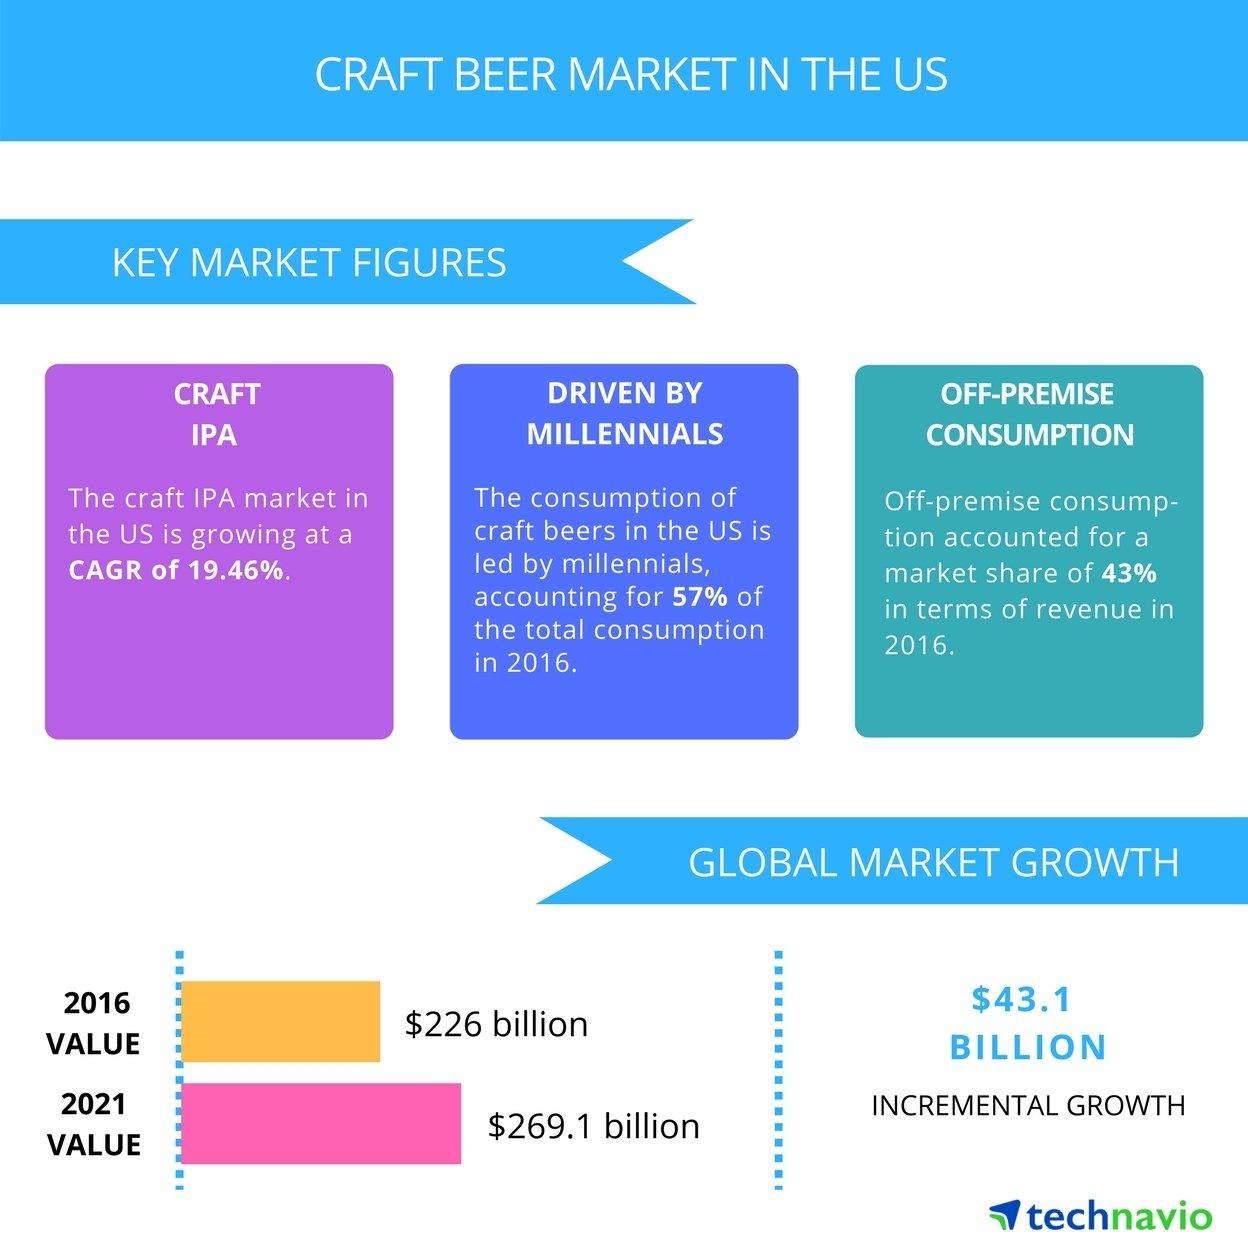 Craft_Beer_Market_in_the_US